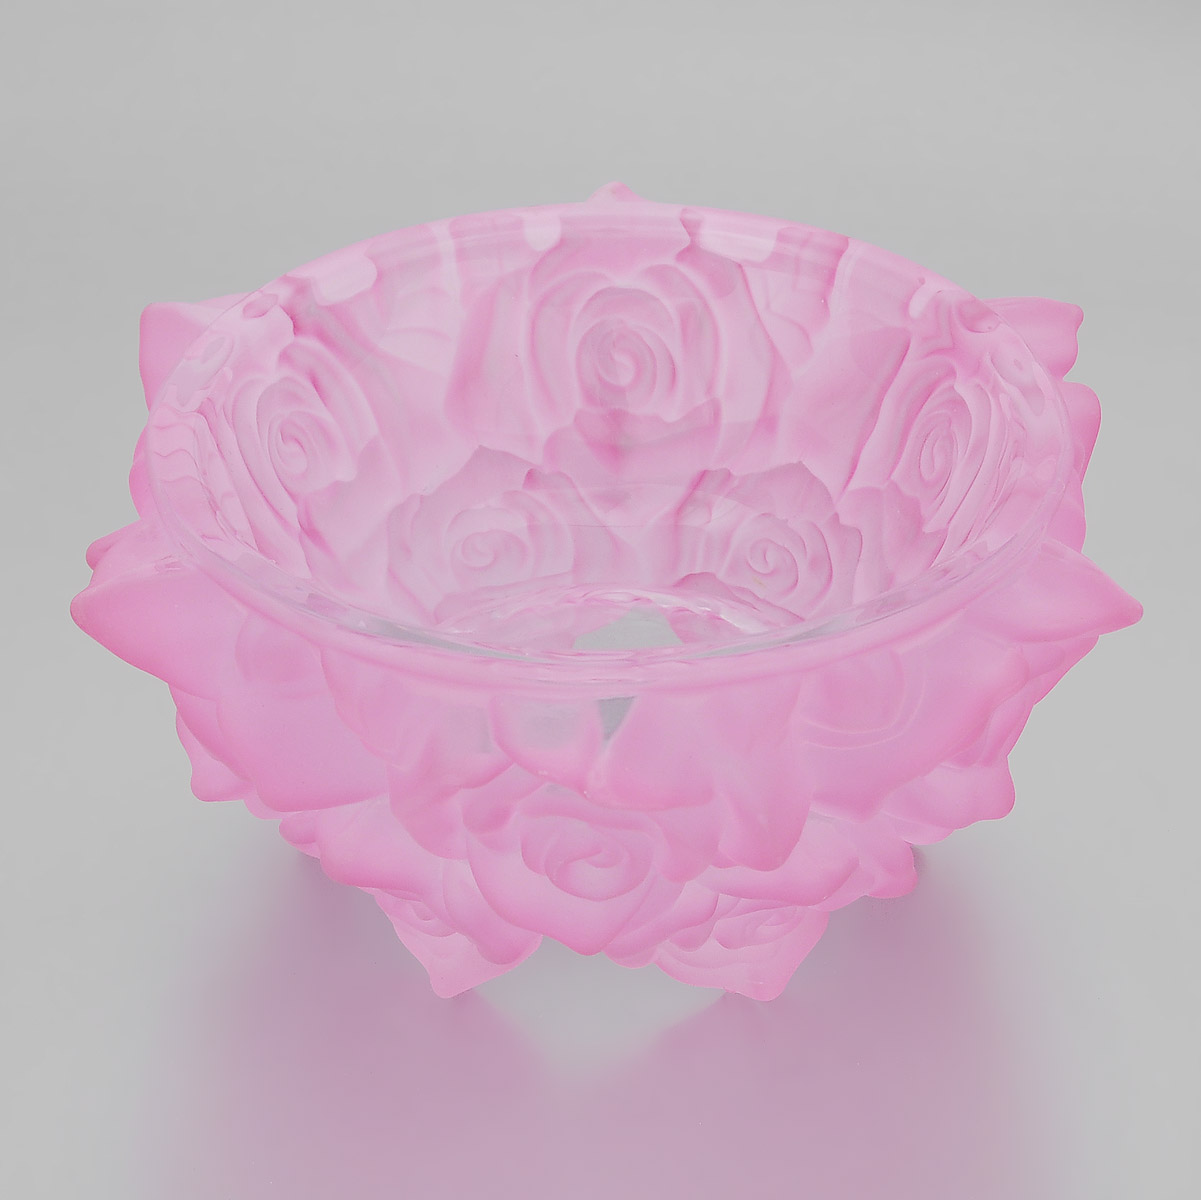 Подсвечник Crystalite Bohemia Роза, цвет: розовый, диаметр 16,5 см7KB23/3/72R68/165